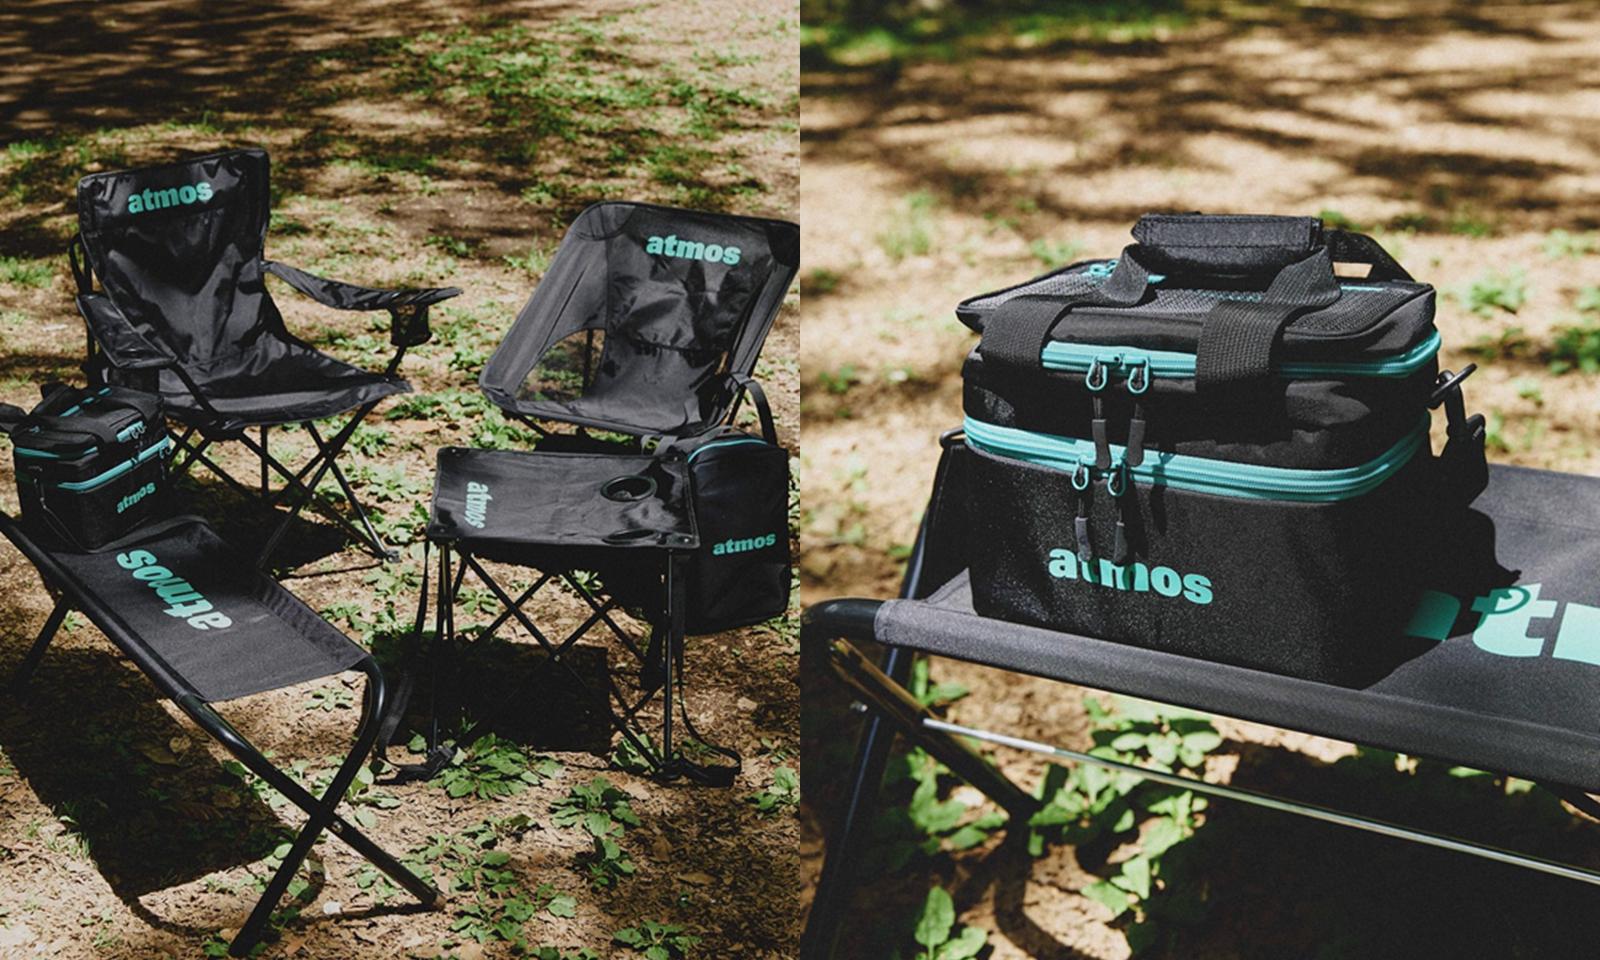 atmos 打造全新露营用品系列